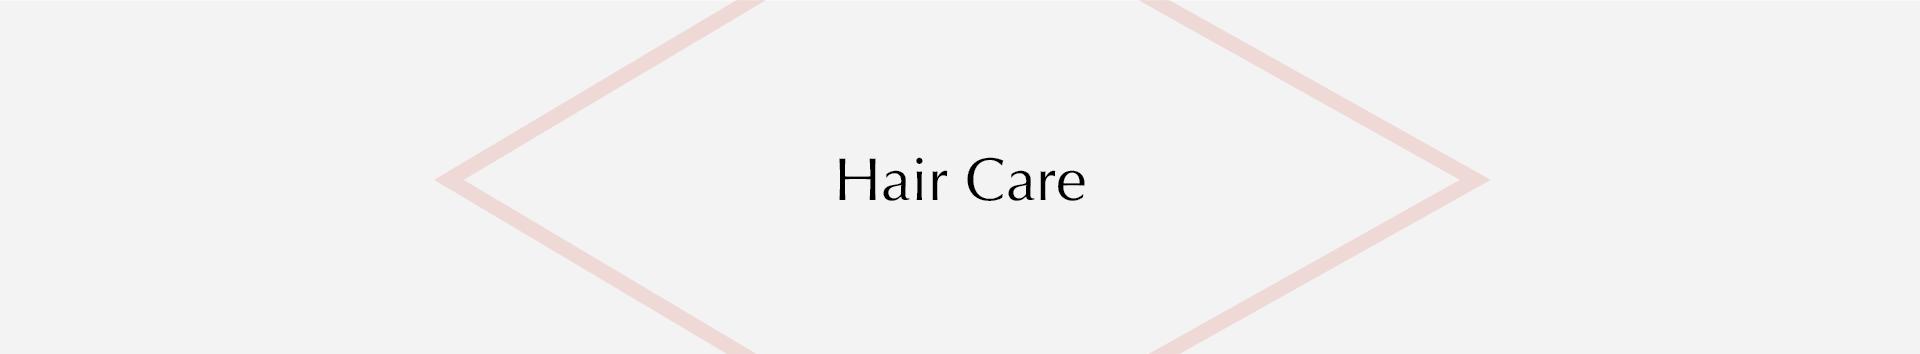 Haircare2.png